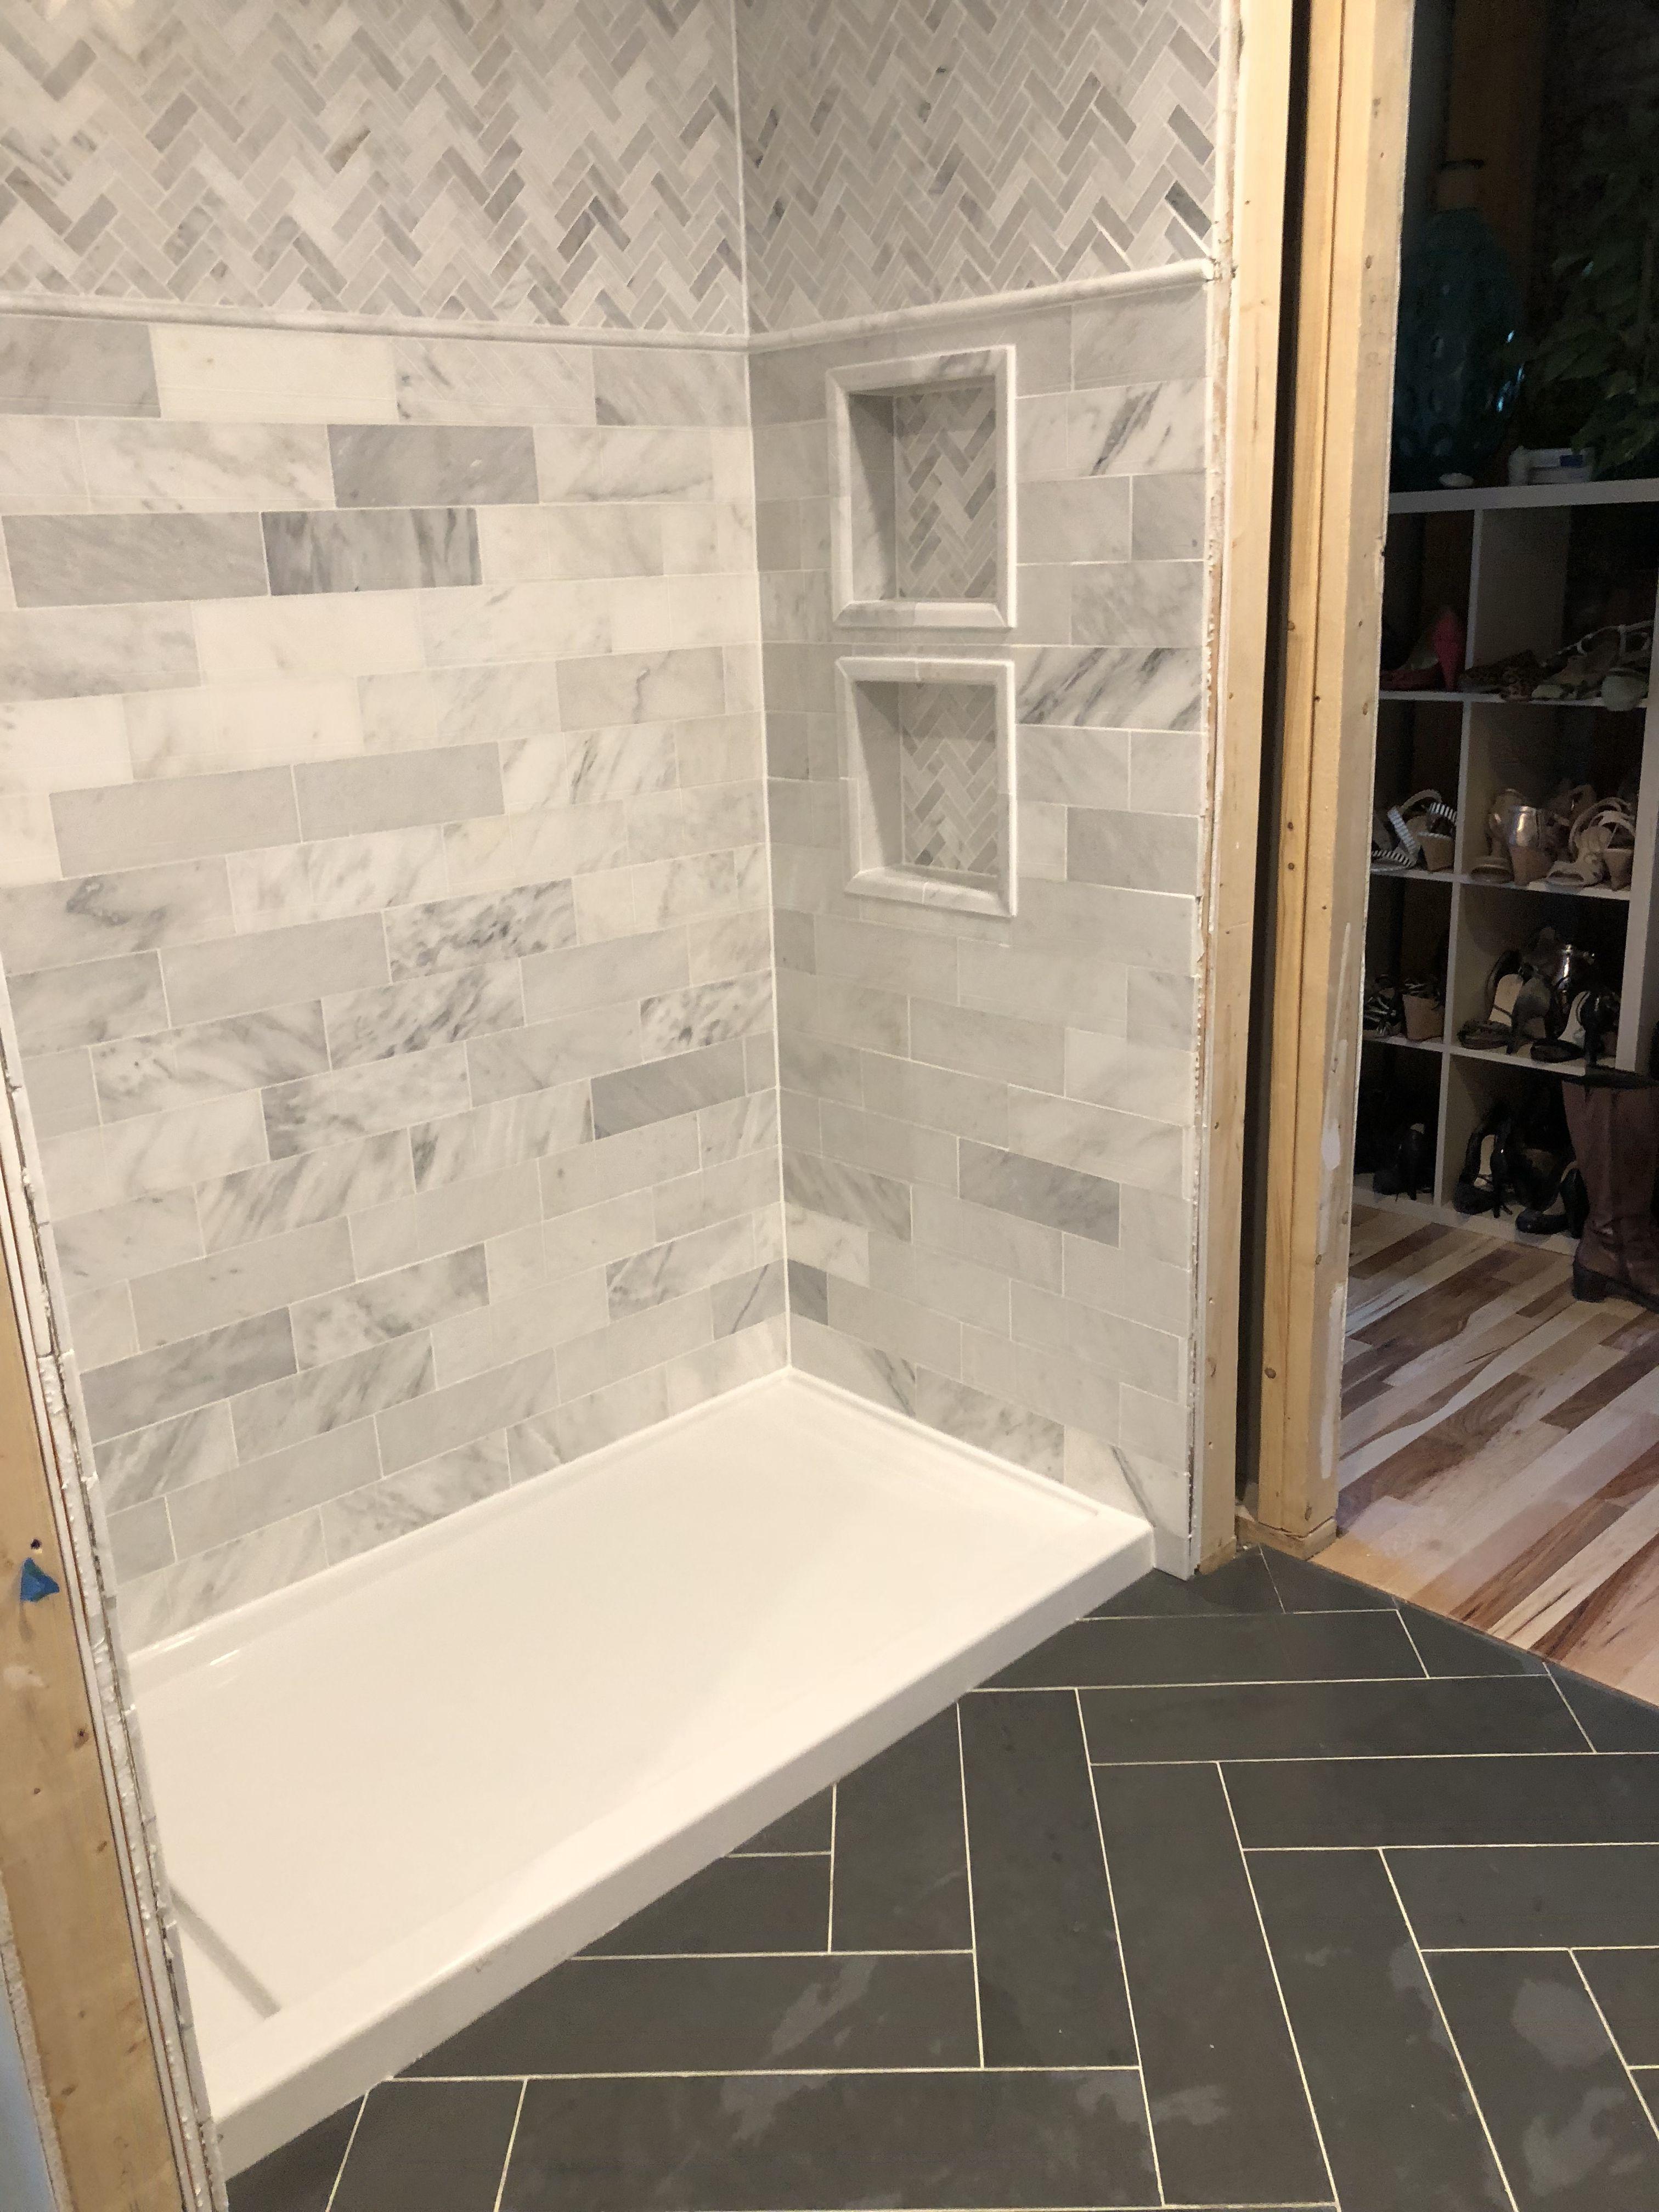 Bathroom Progress 6x24 Herringbone Slate Floor Tile 4x12 Marble